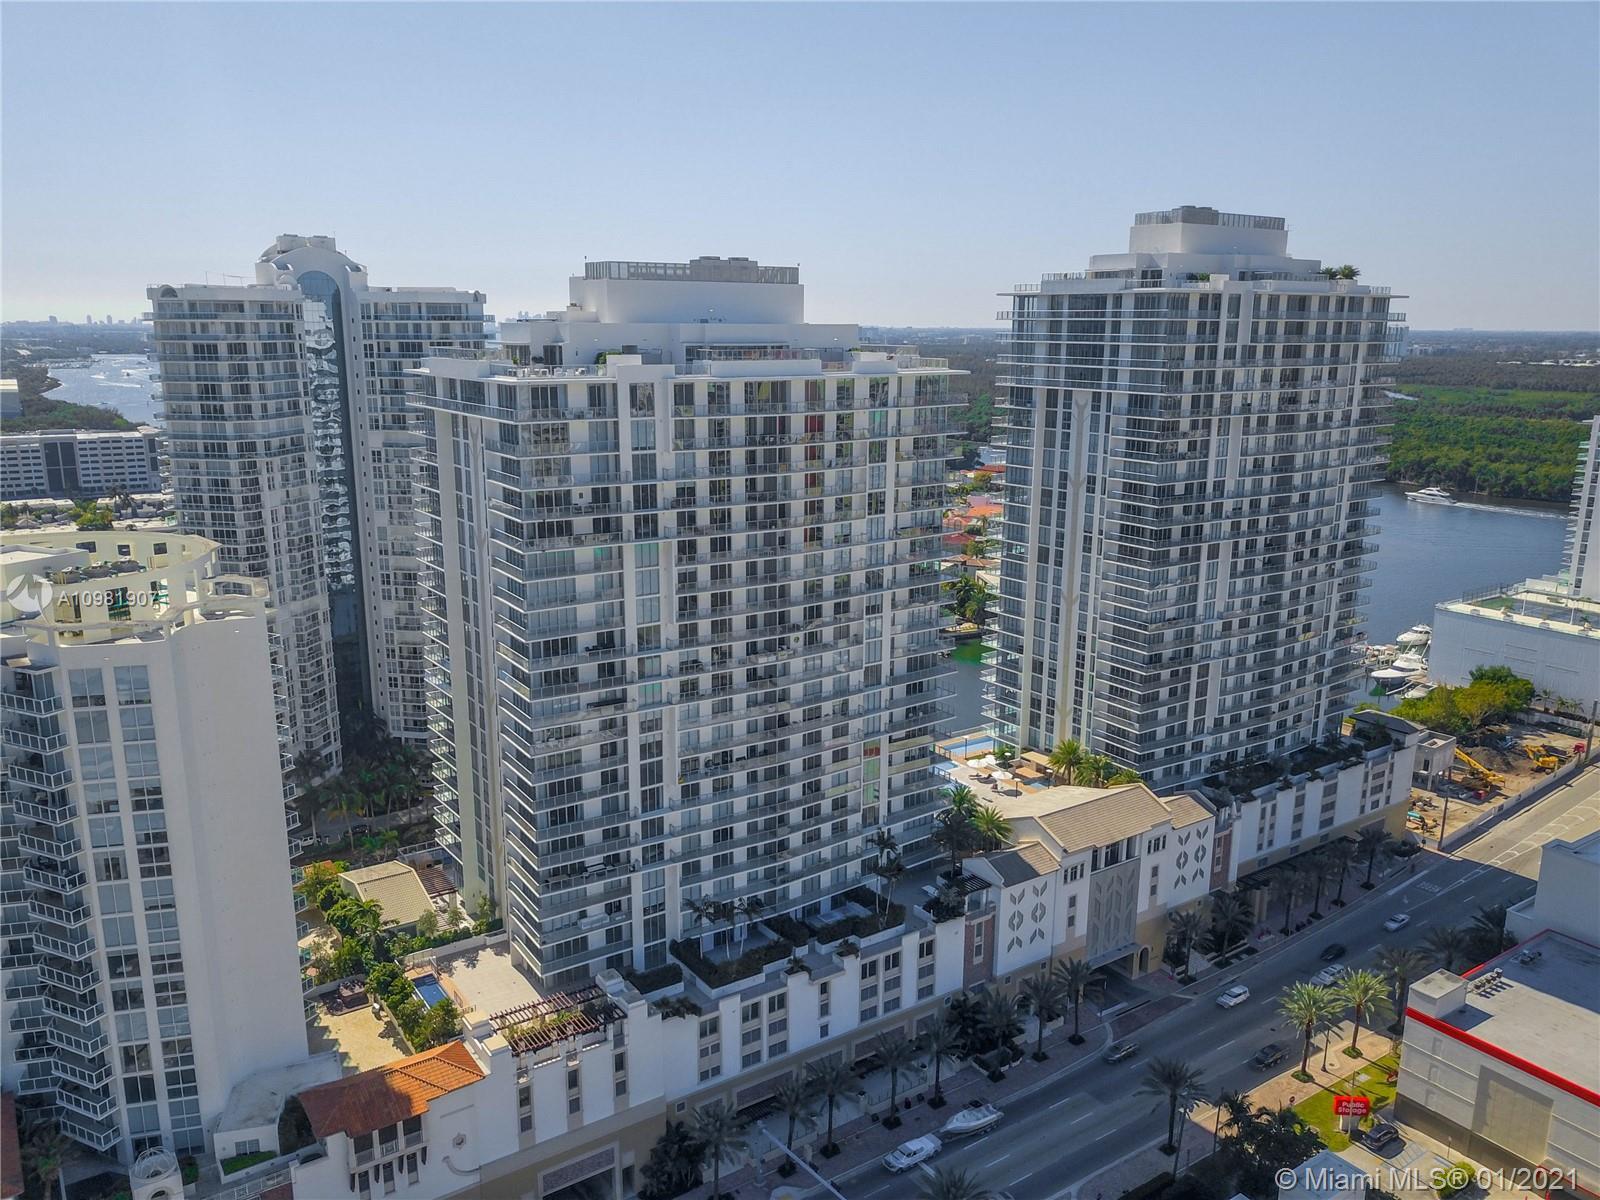 Parque Tower 1 #4-907 - 300 SUNNY ISLES BLVD #4-907, Sunny Isles Beach, FL 33160